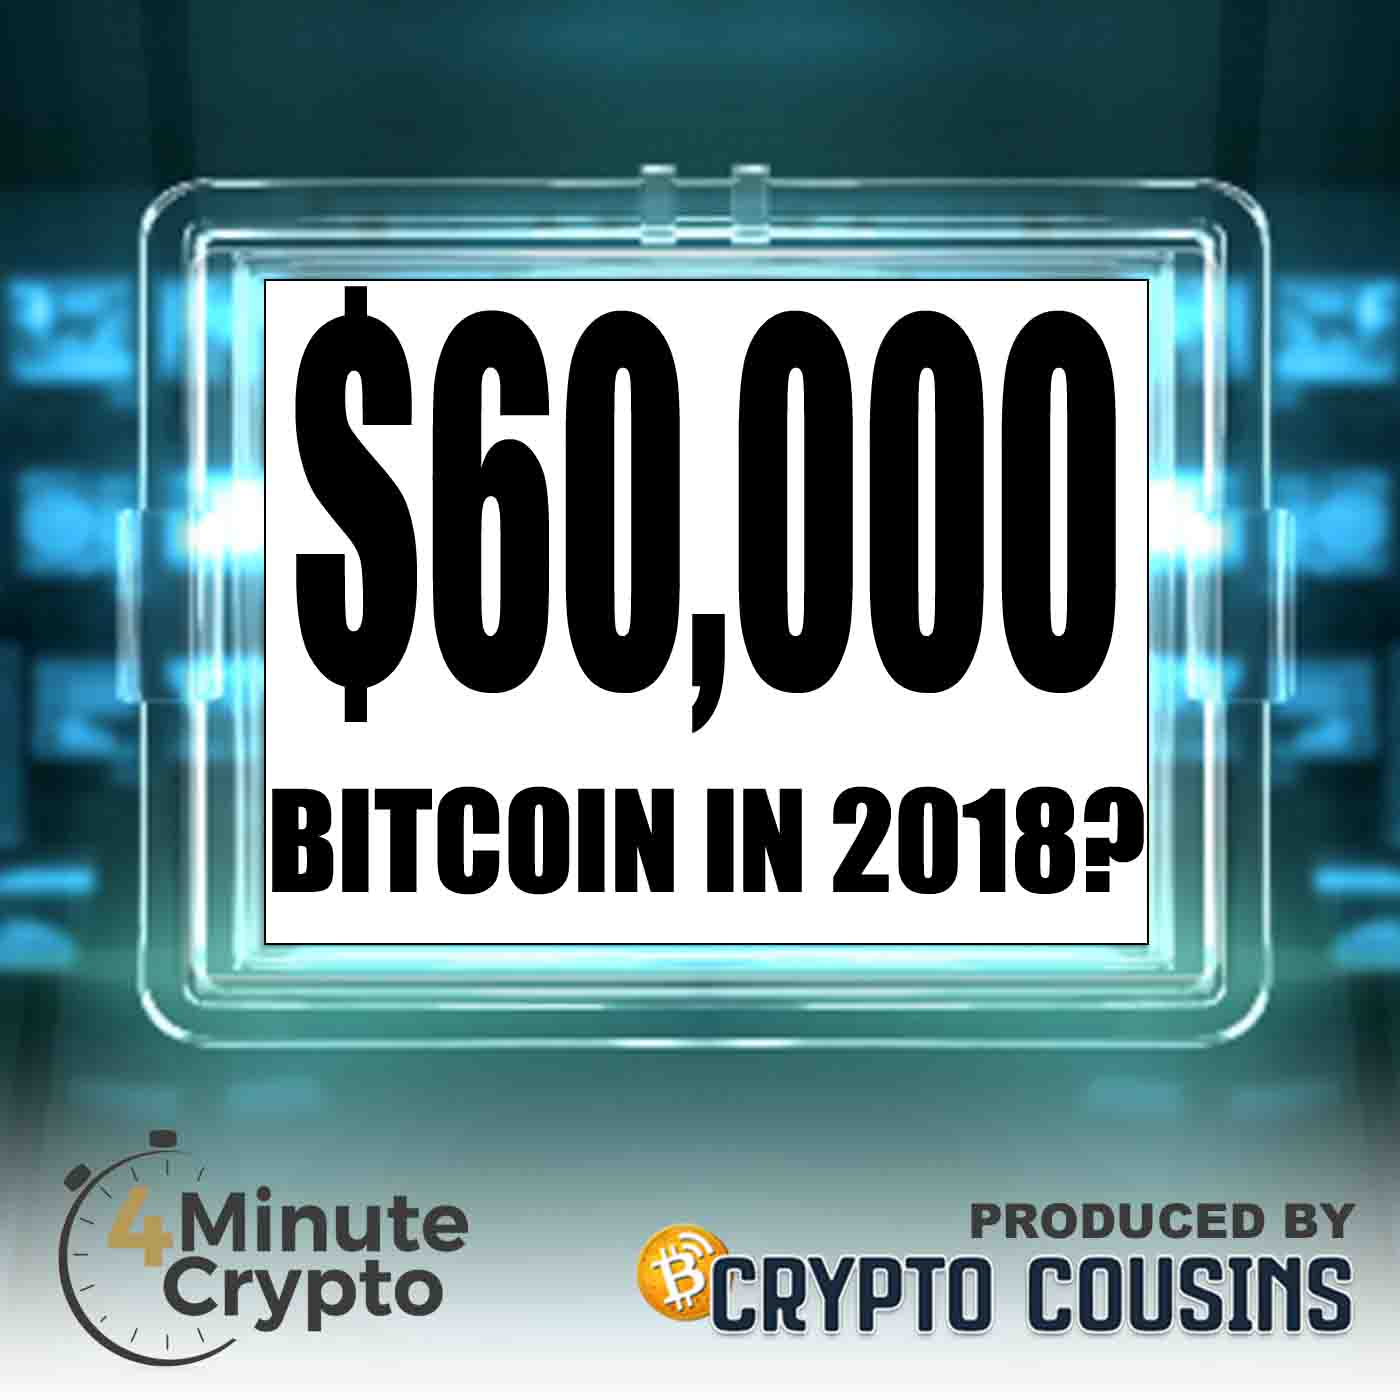 Bitcoin Price To Reach $60,000?| 4 Minute Crypto S1E69